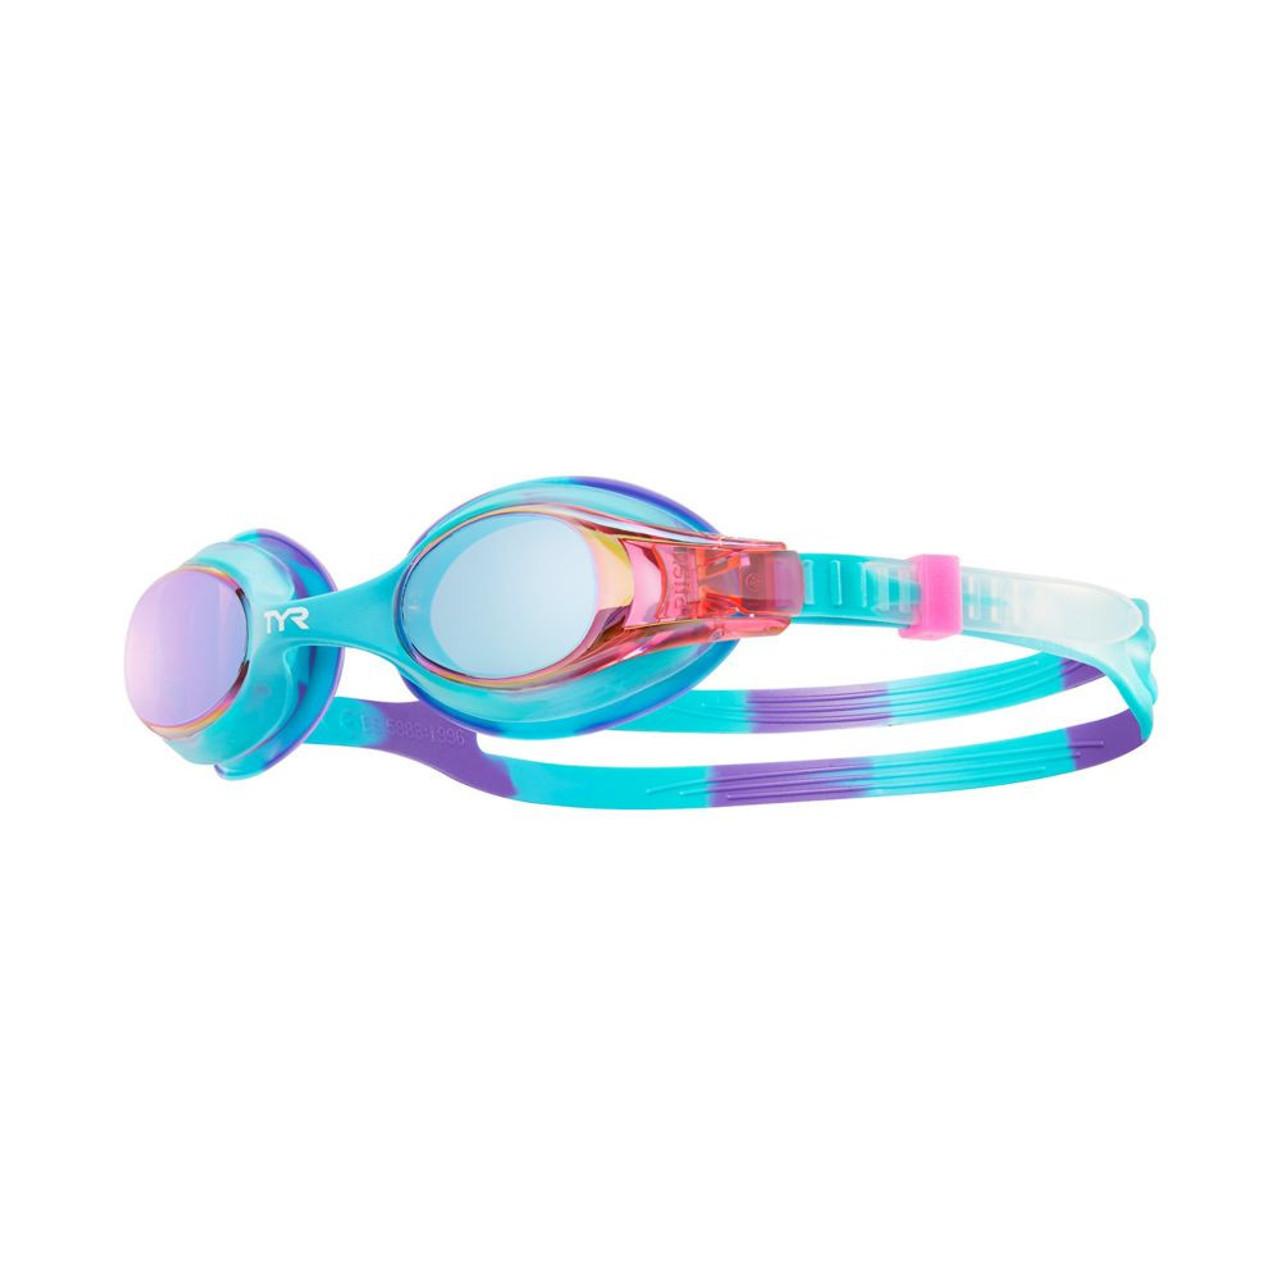 8fcc6b04ed TYR Kids Swimple Tie Dye Mirrored Goggle